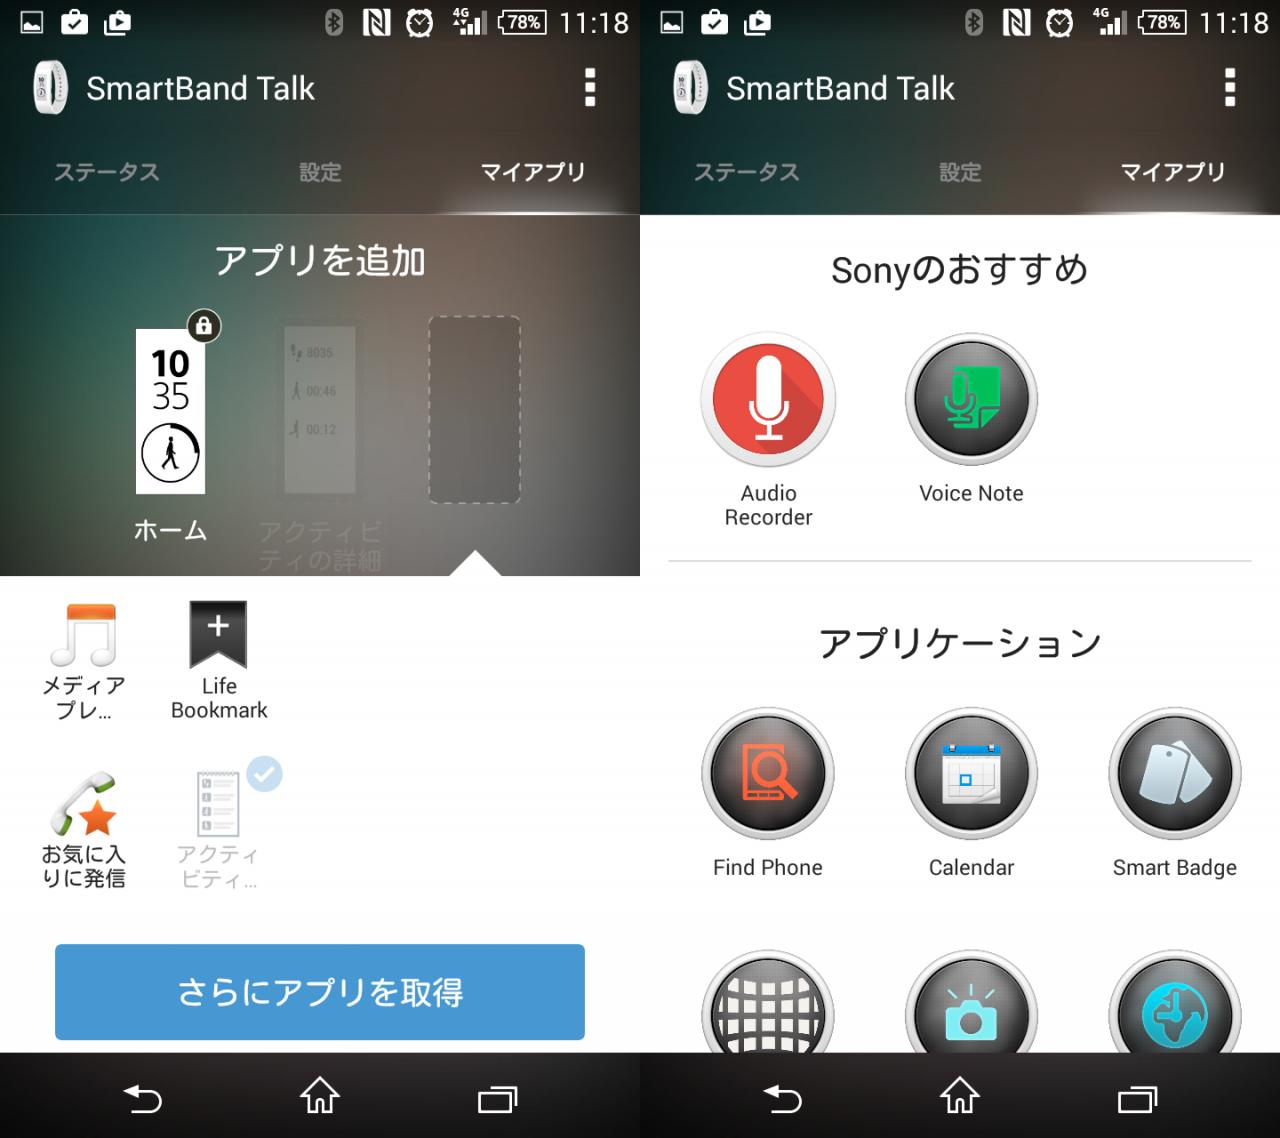 smartband2